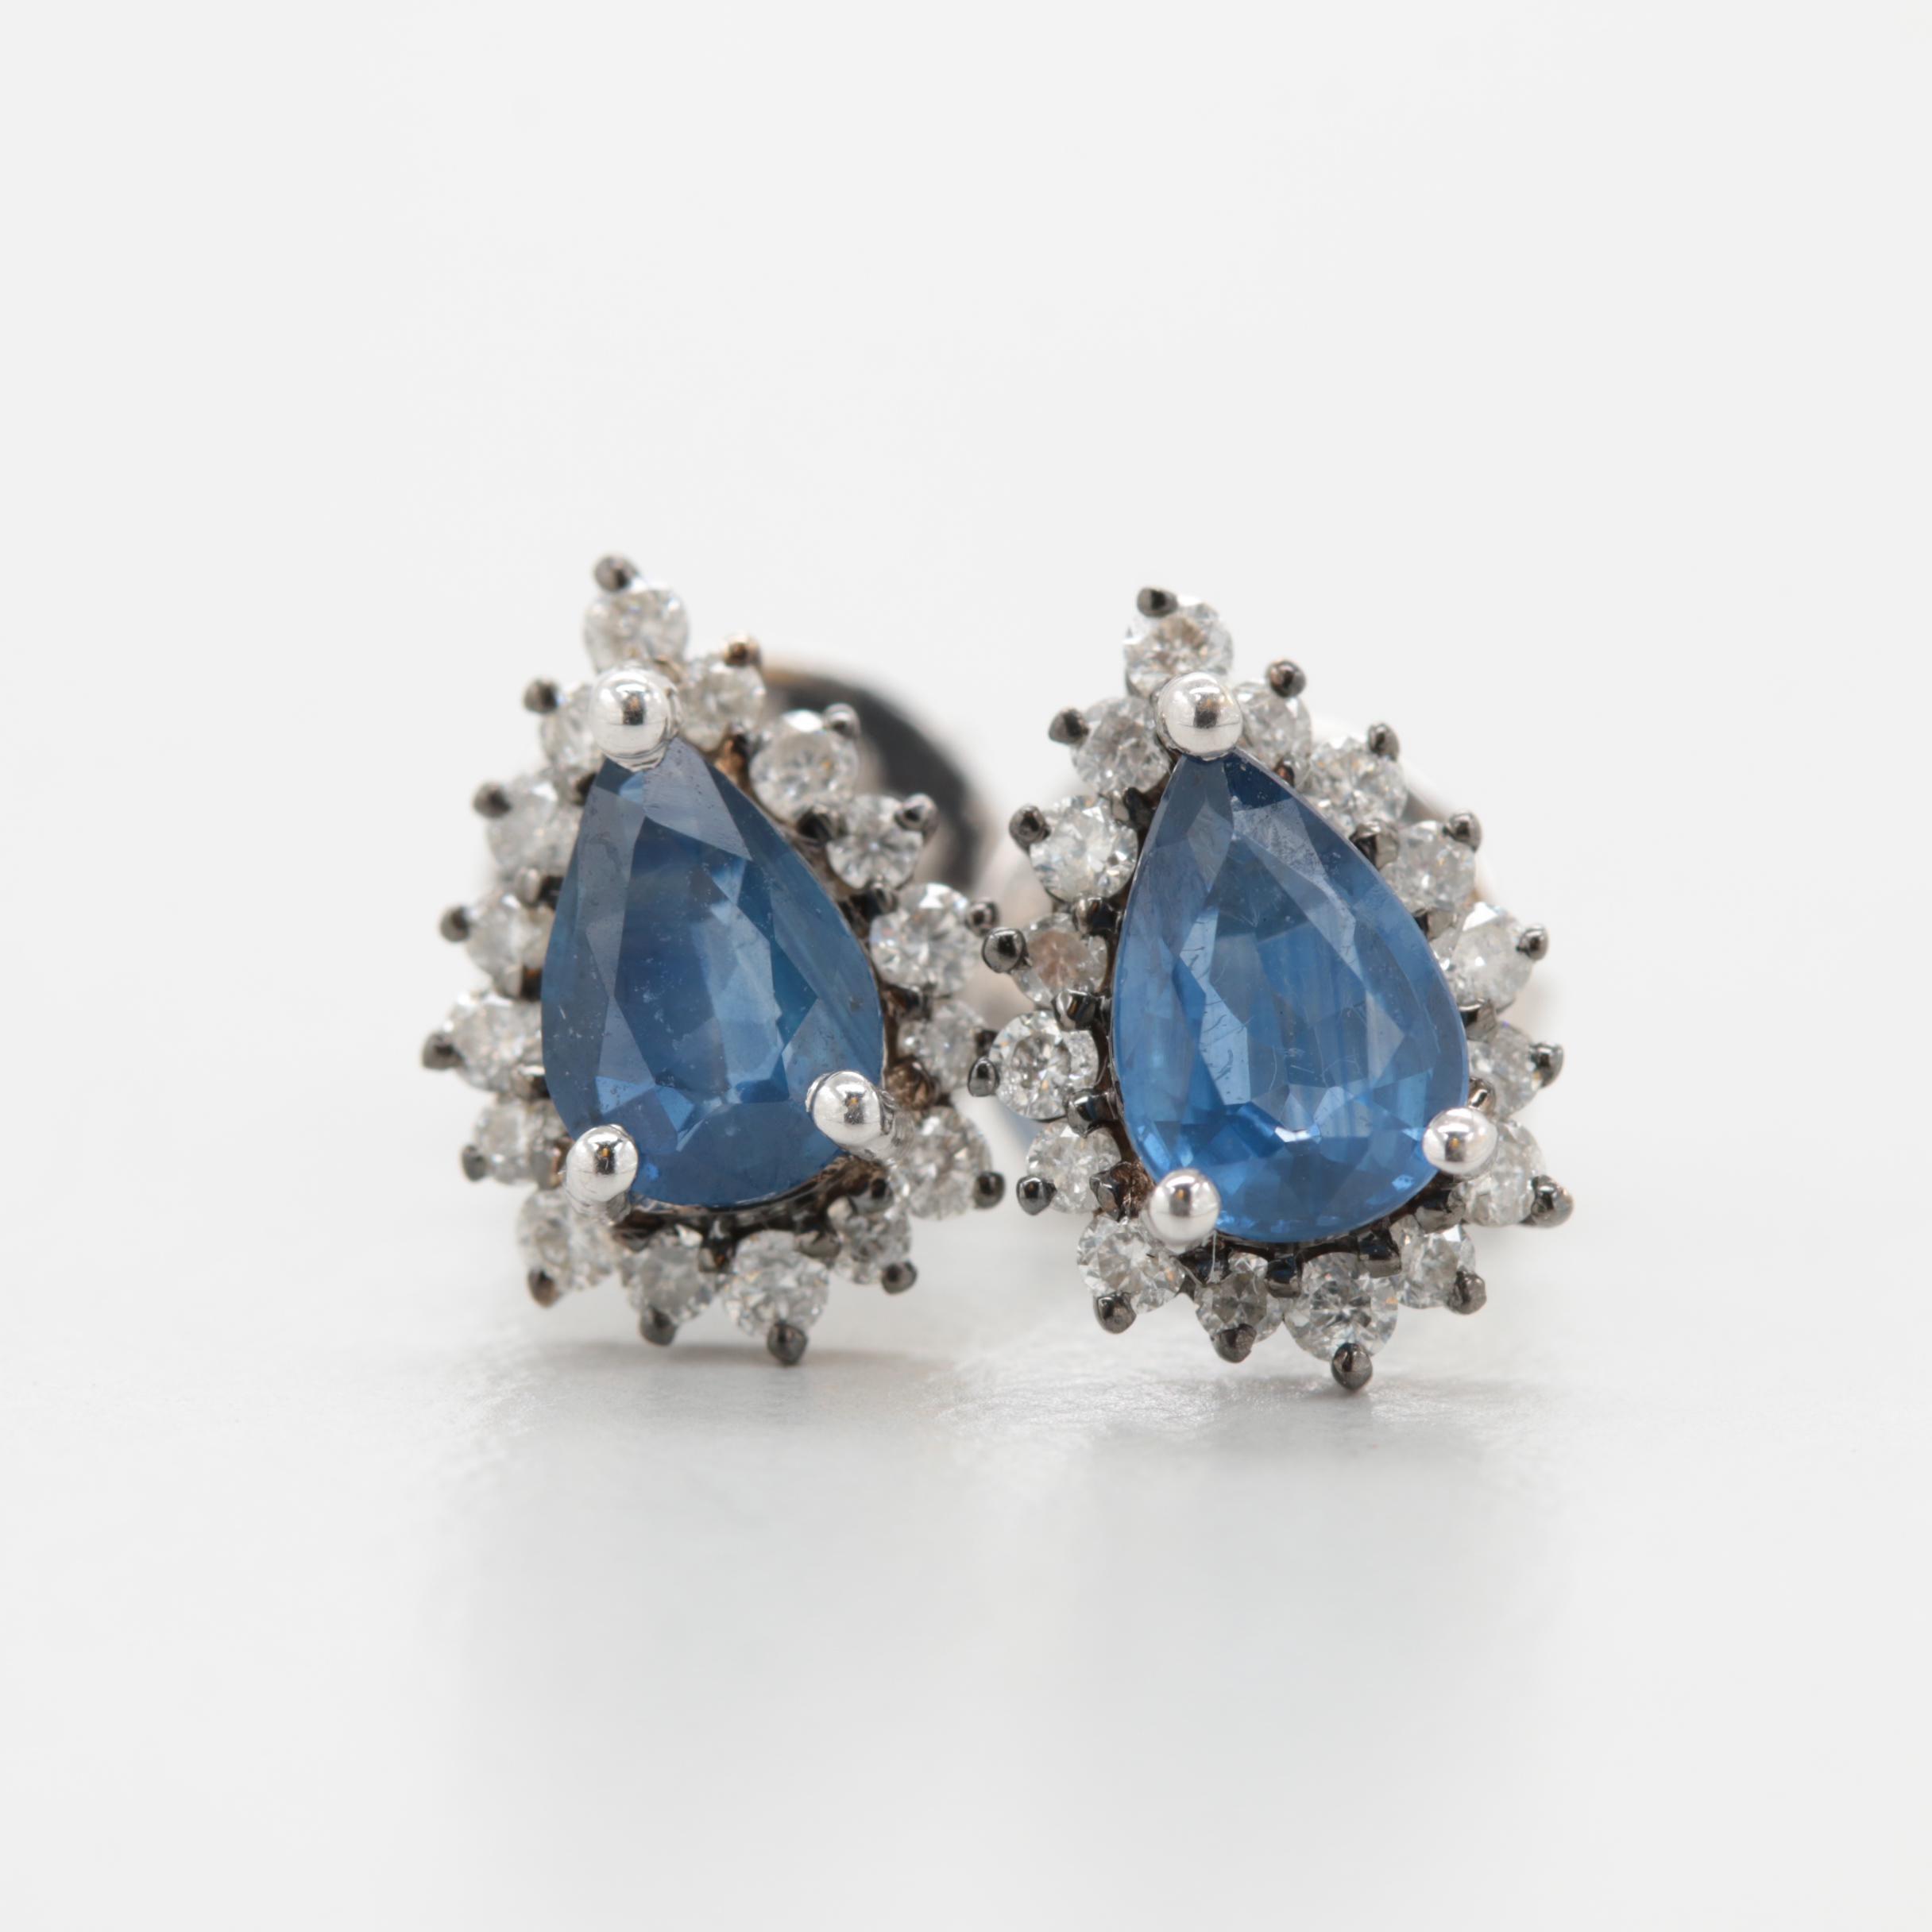 18K White Gold Blue Sapphire and Diamond Earrings